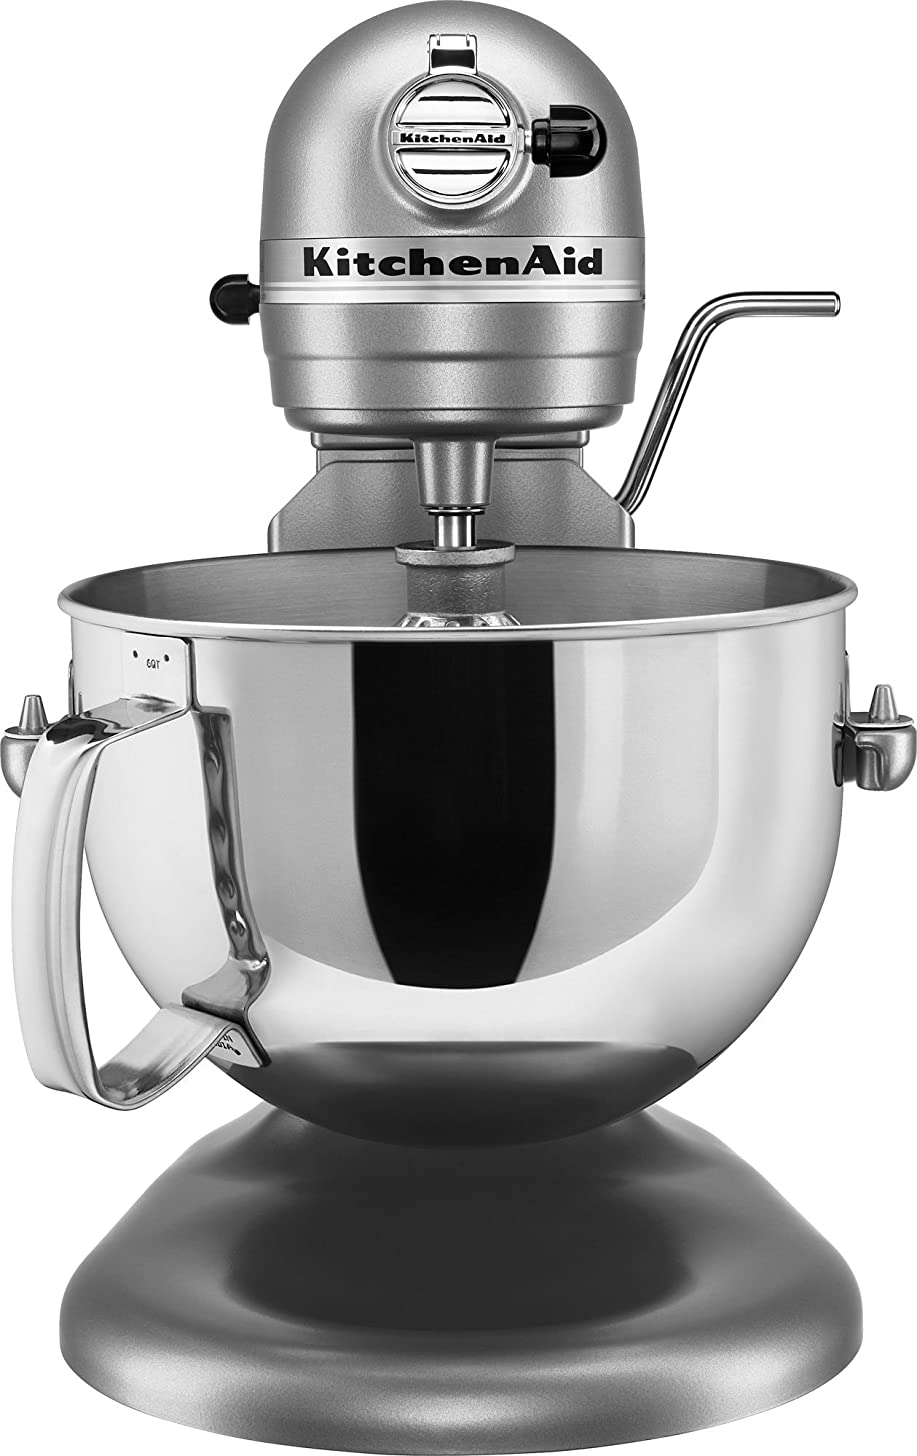 KitchenAid Professional 5 Plus Series Stand Mixers -  Silver